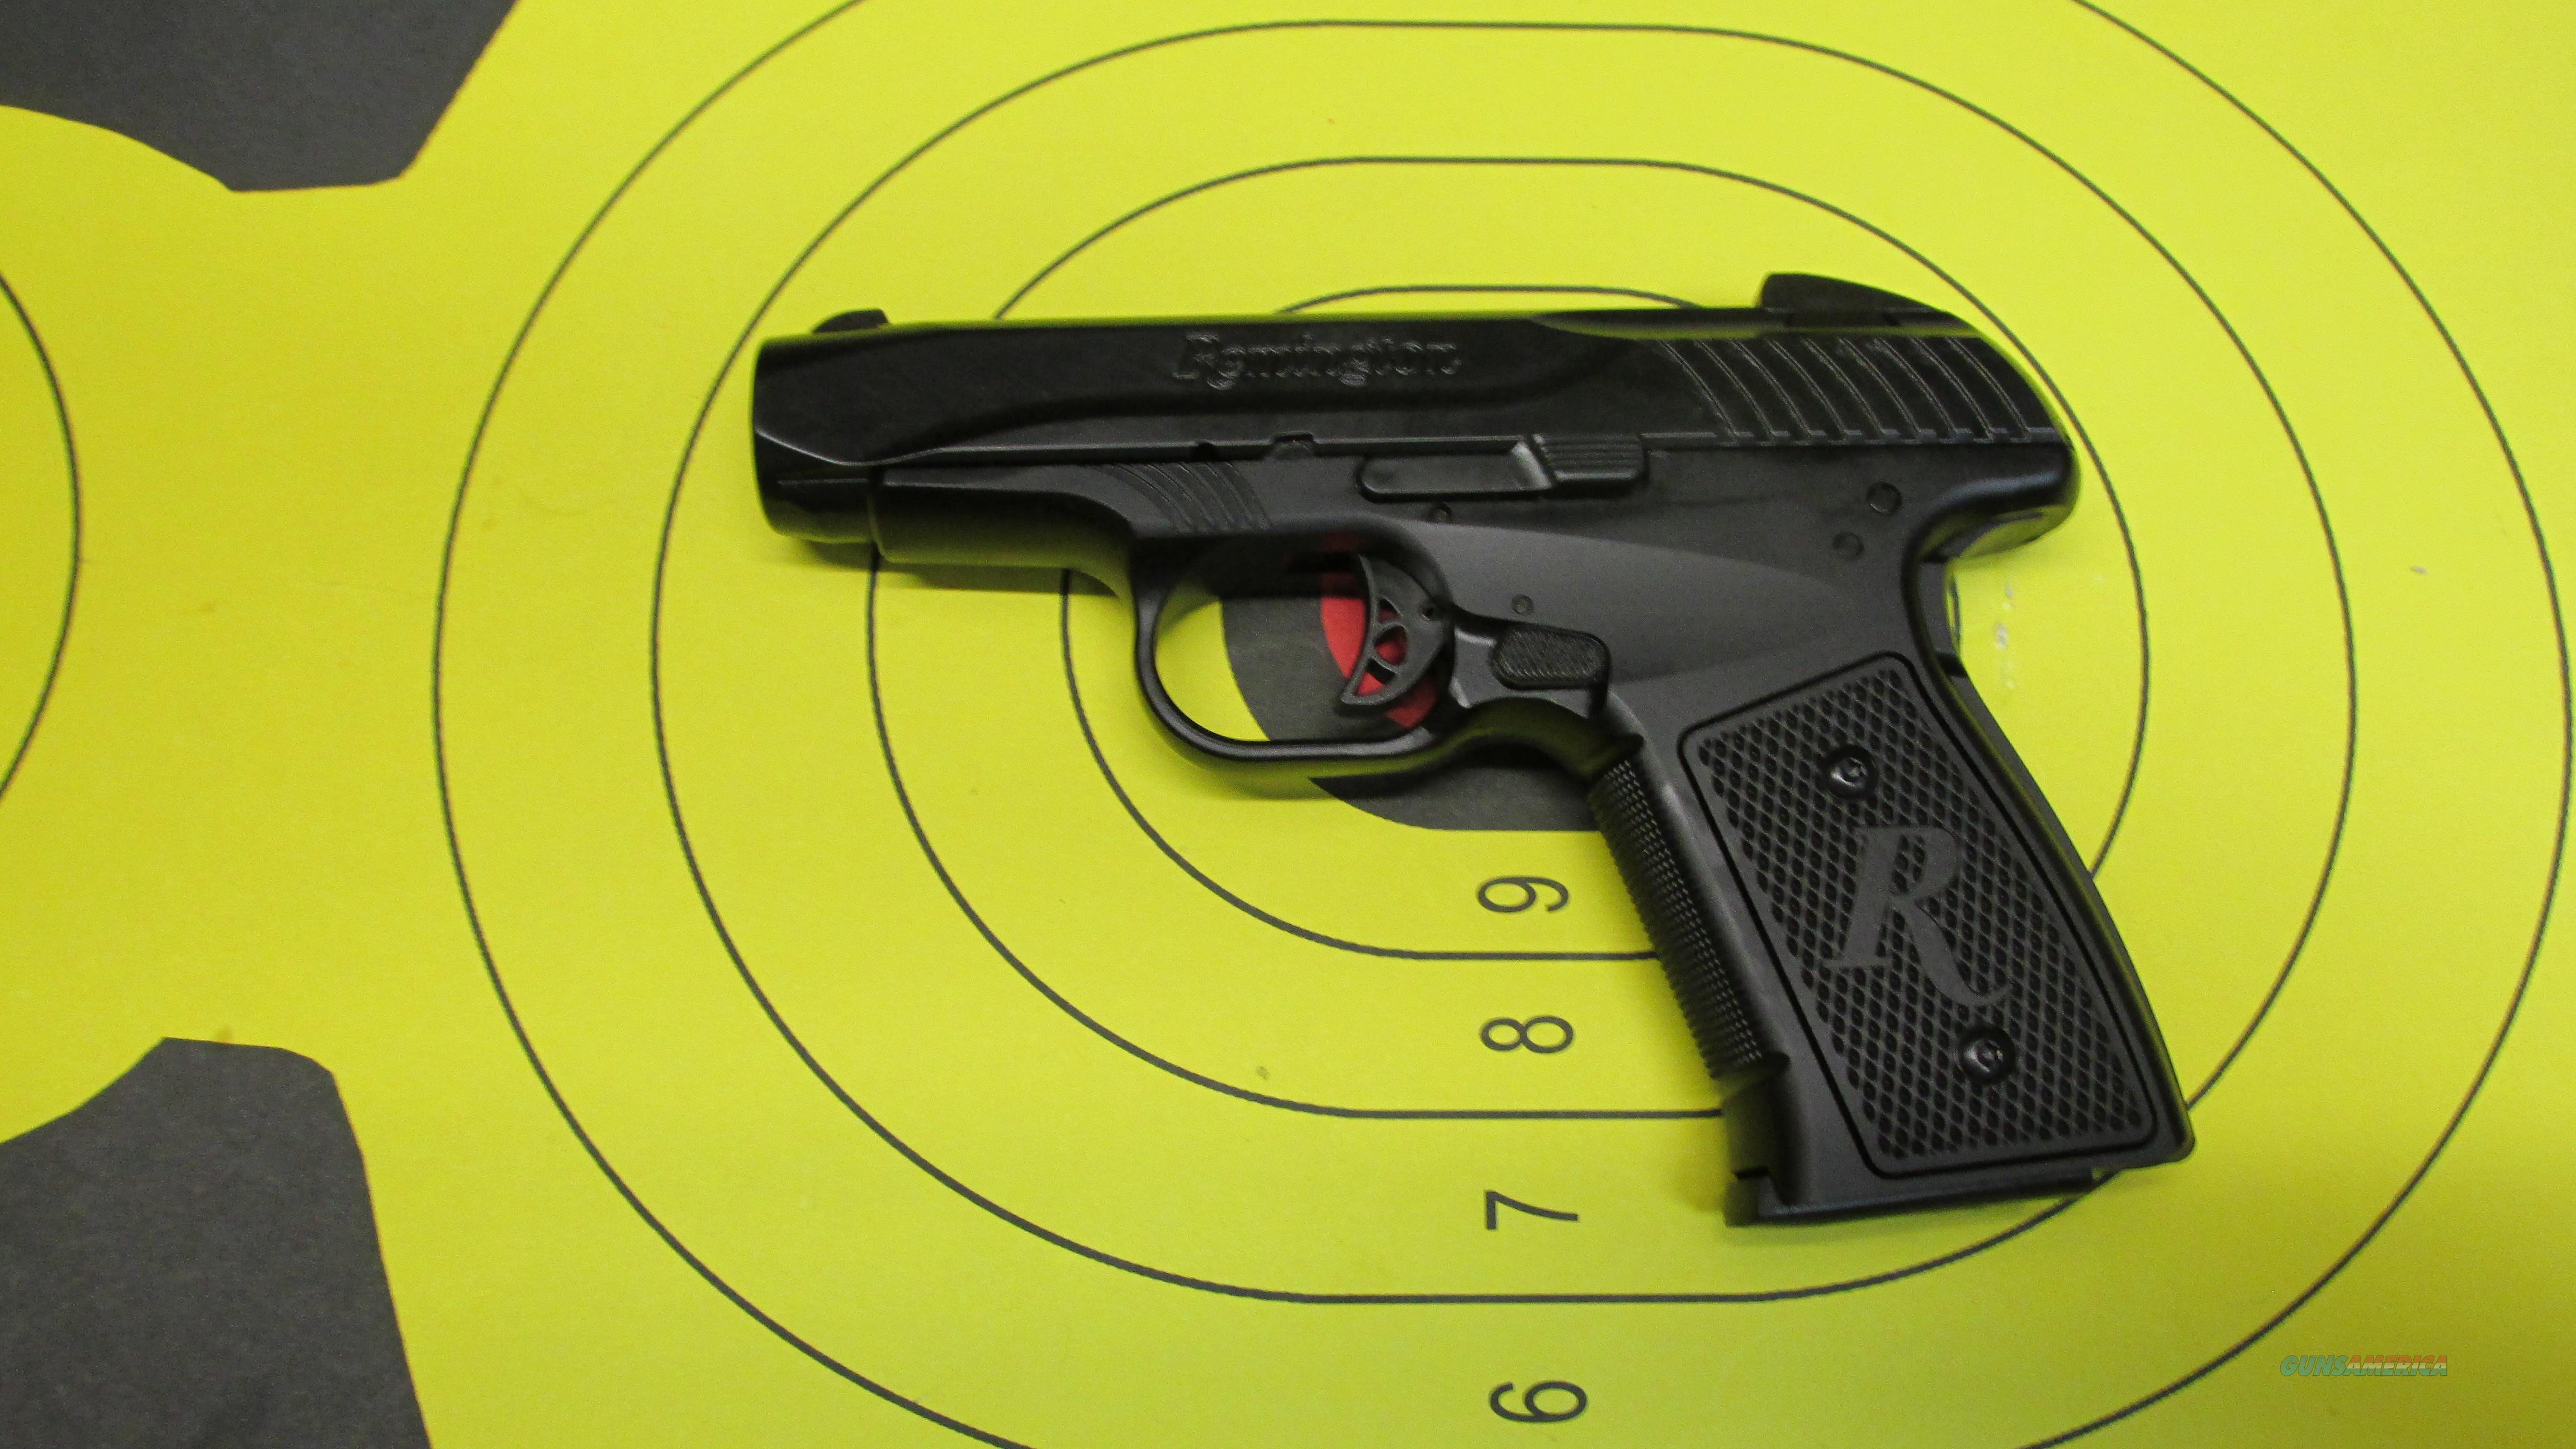 "REMINGTON R51 9MM PISTOL 2 7 ROUND MAGAZINES WITH A 3.4"" BARREL  Guns > Pistols > Remington Pistols XP-100"